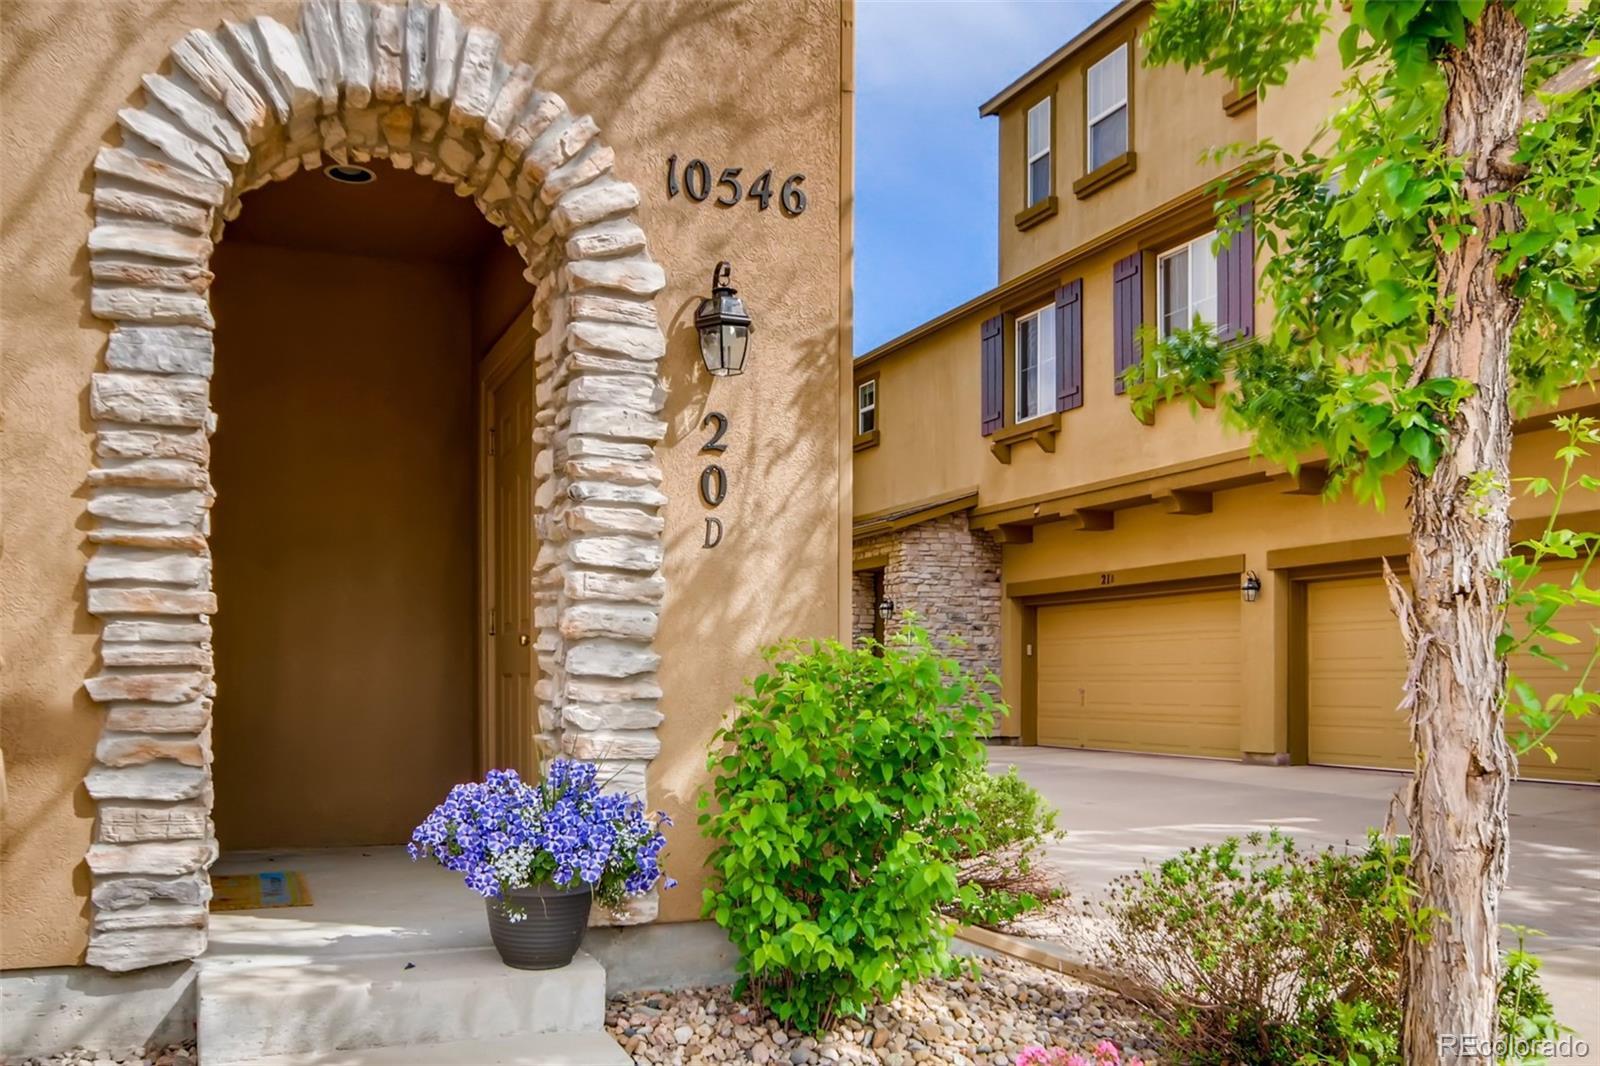 MLS# 4234095 - 27 - 10546 Graymont Lane #D, Highlands Ranch, CO 80126